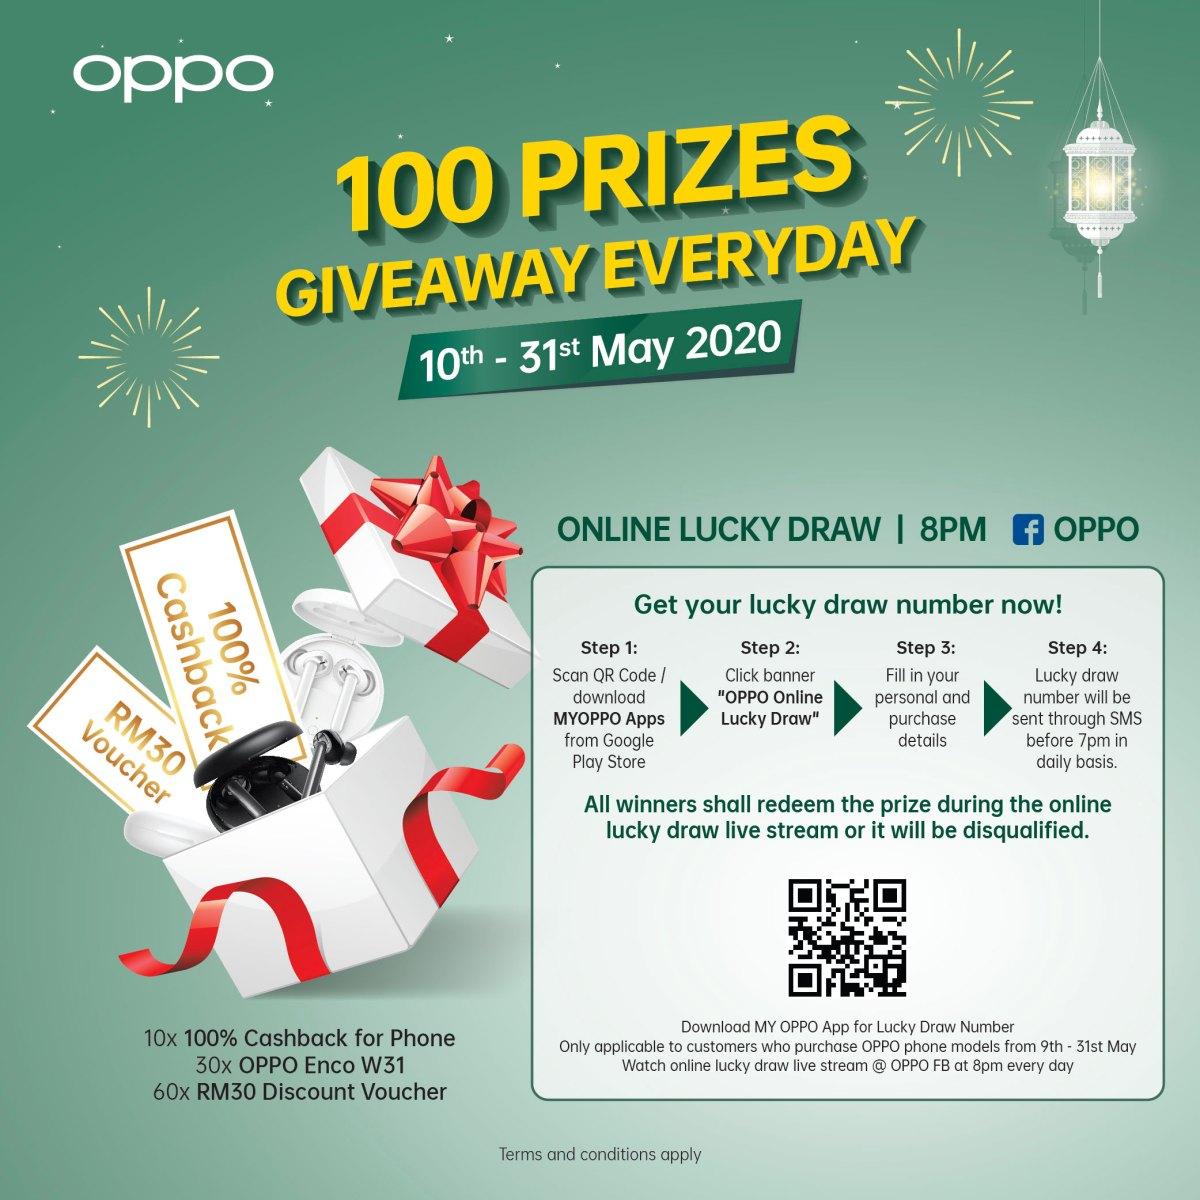 OPPO Raya期间送好康!Find X2、Reno系列等手机可享最高RM499赠品、参加抽奖还可享现金回扣! OPPO-Raya-Lucky-Draw